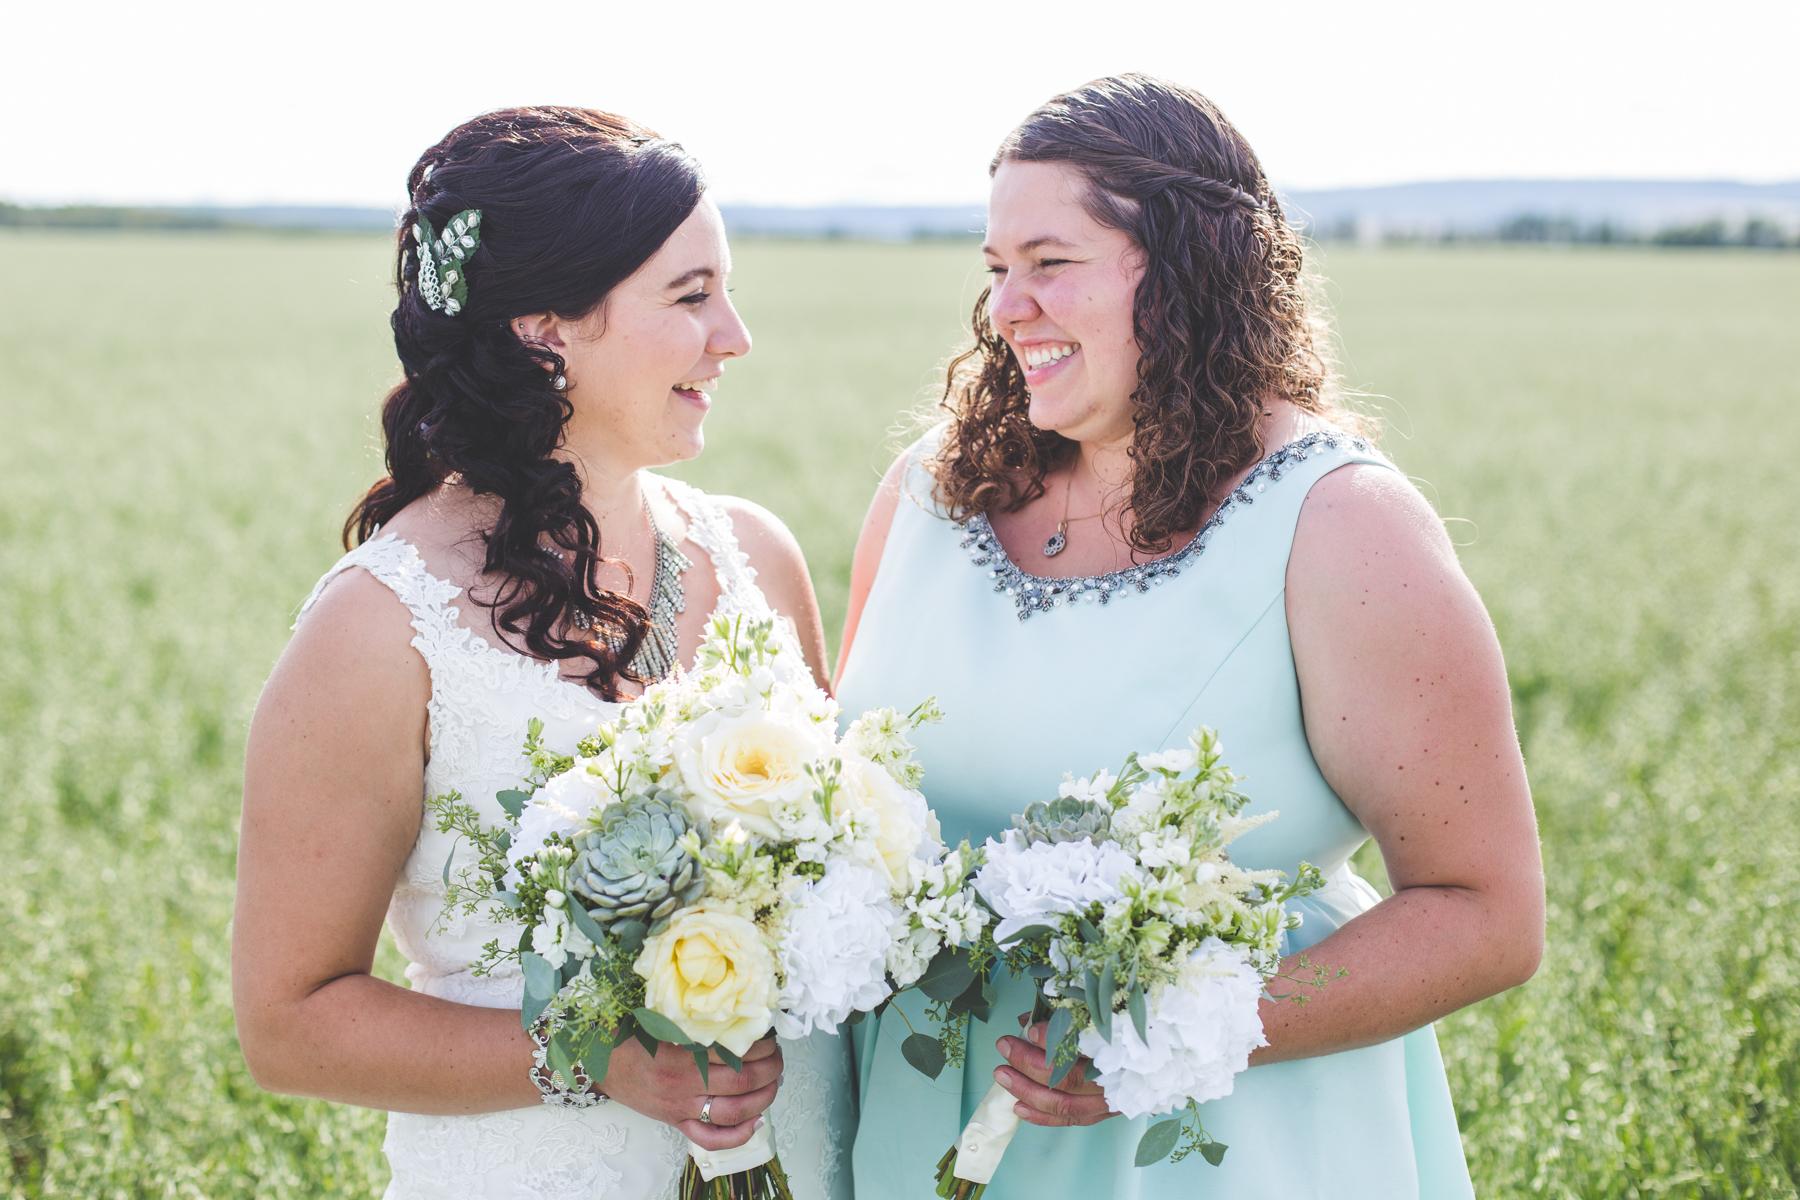 20150808-oglovewedding-535.jpg